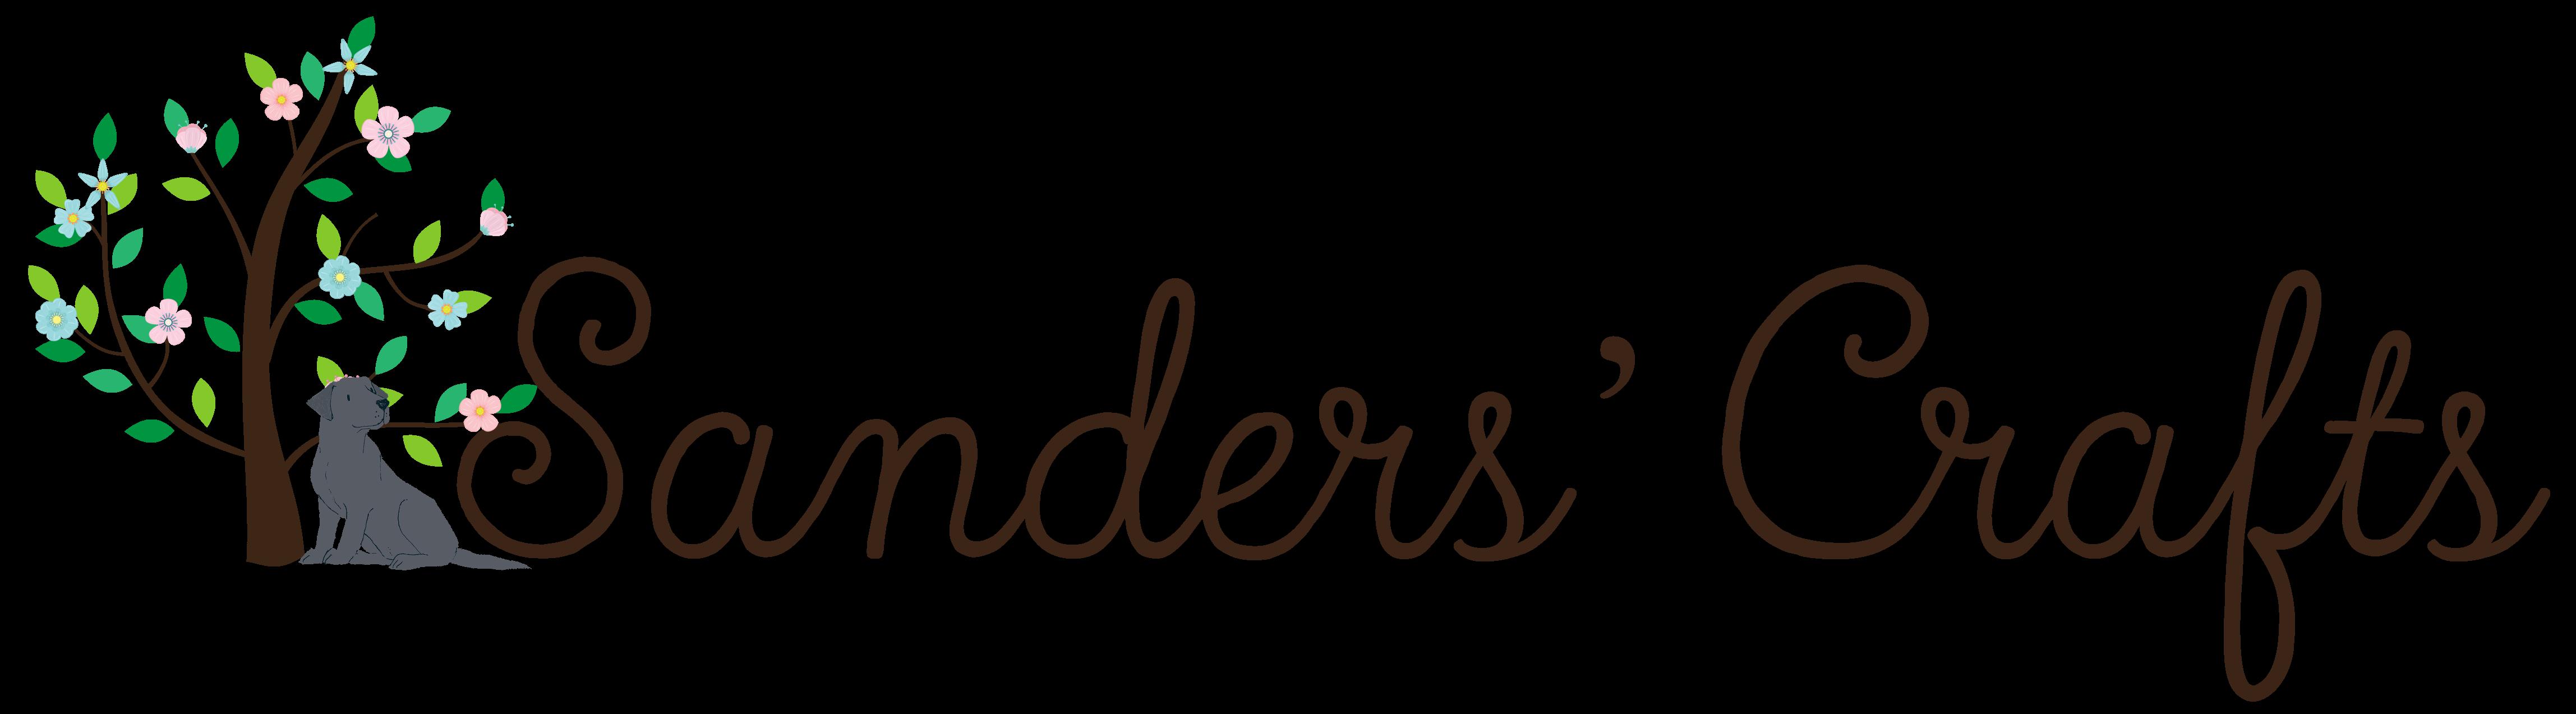 Sanders' Crafts